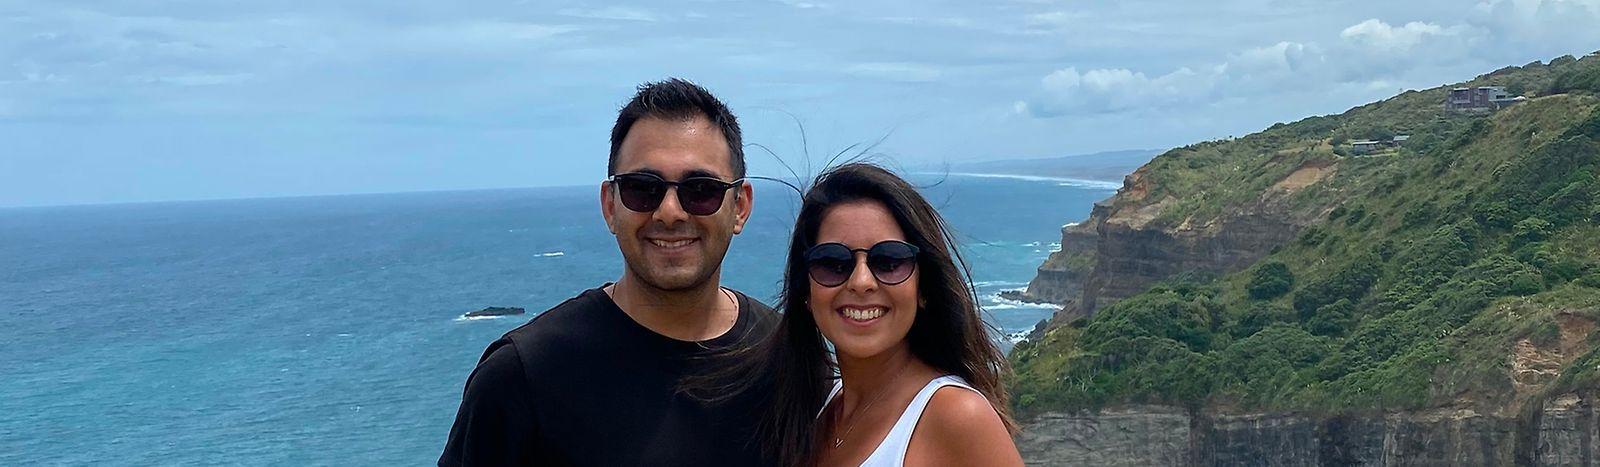 Portugueses Dirav e Vidhya em Auckland.